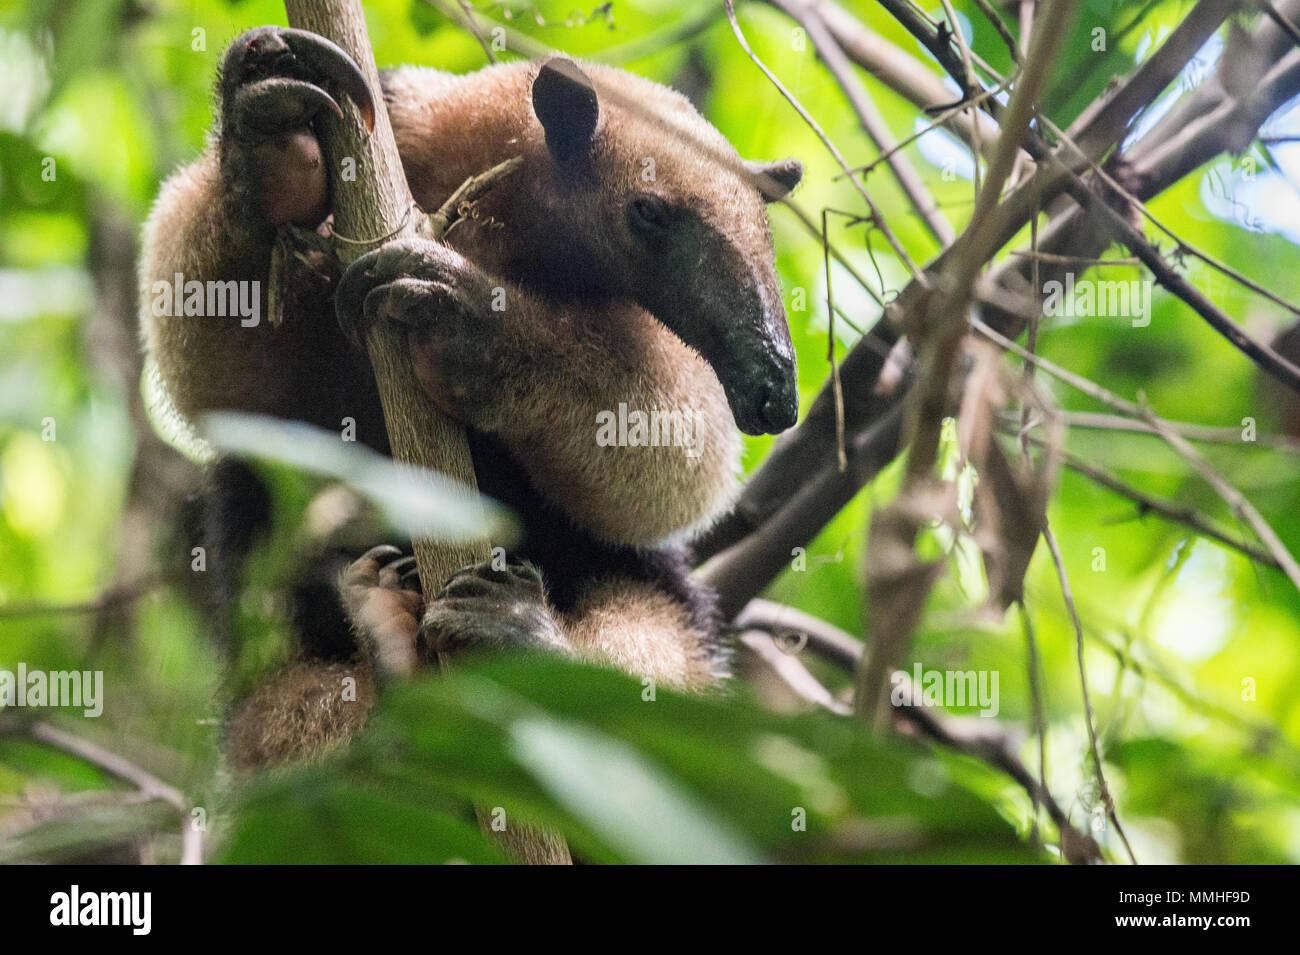 Tamandua settentrionale, Tamandua mexicana, Myrmecophagidae, Parco Nazionale di Corcovado, Costa Rica, Centroamerica Immagini Stock